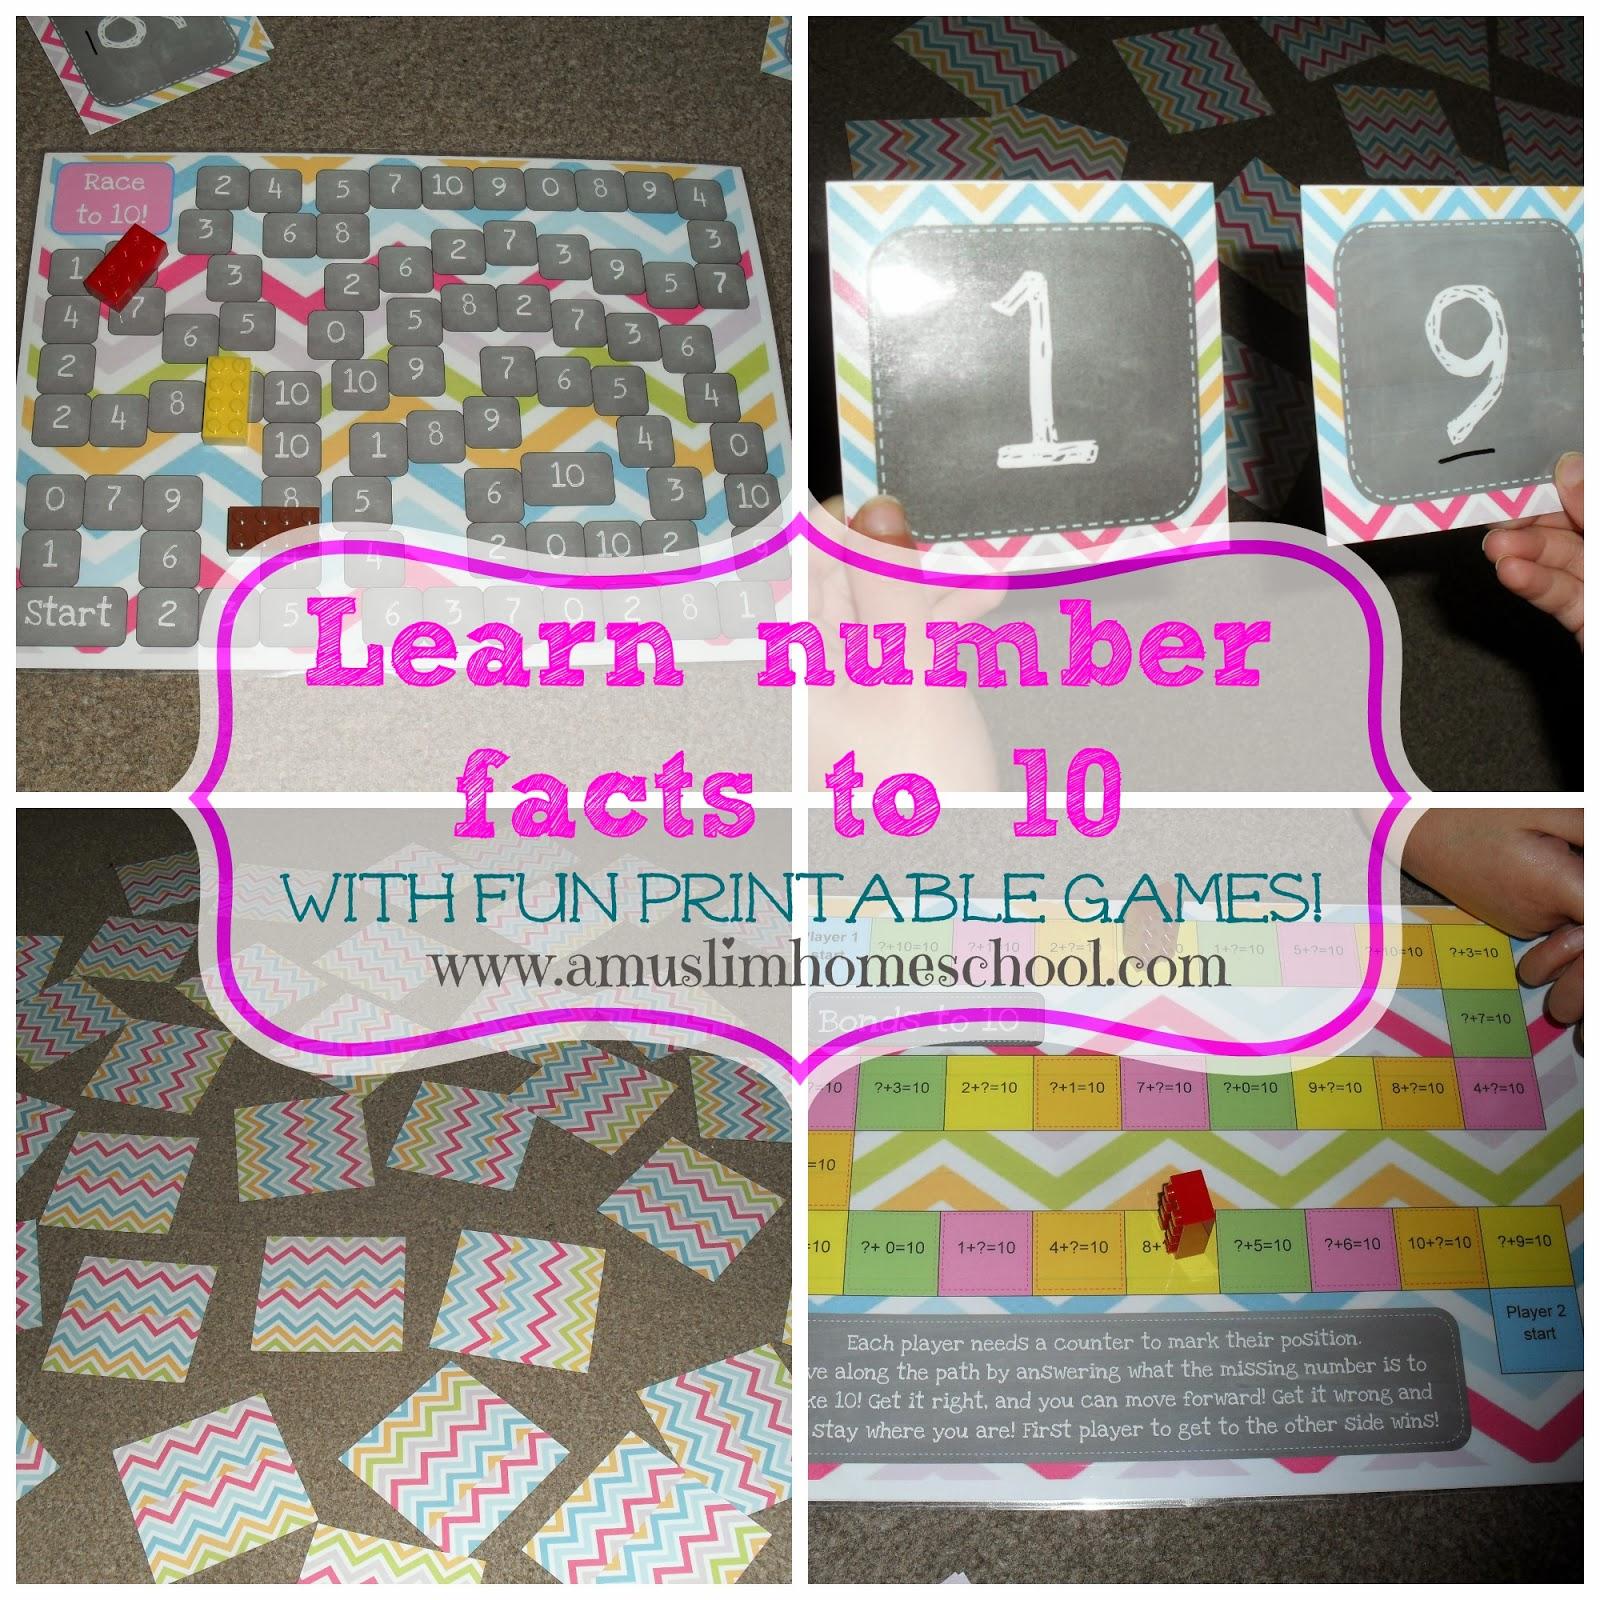 A Muslim Homeschool Fun Free Maths Games To Learn Number